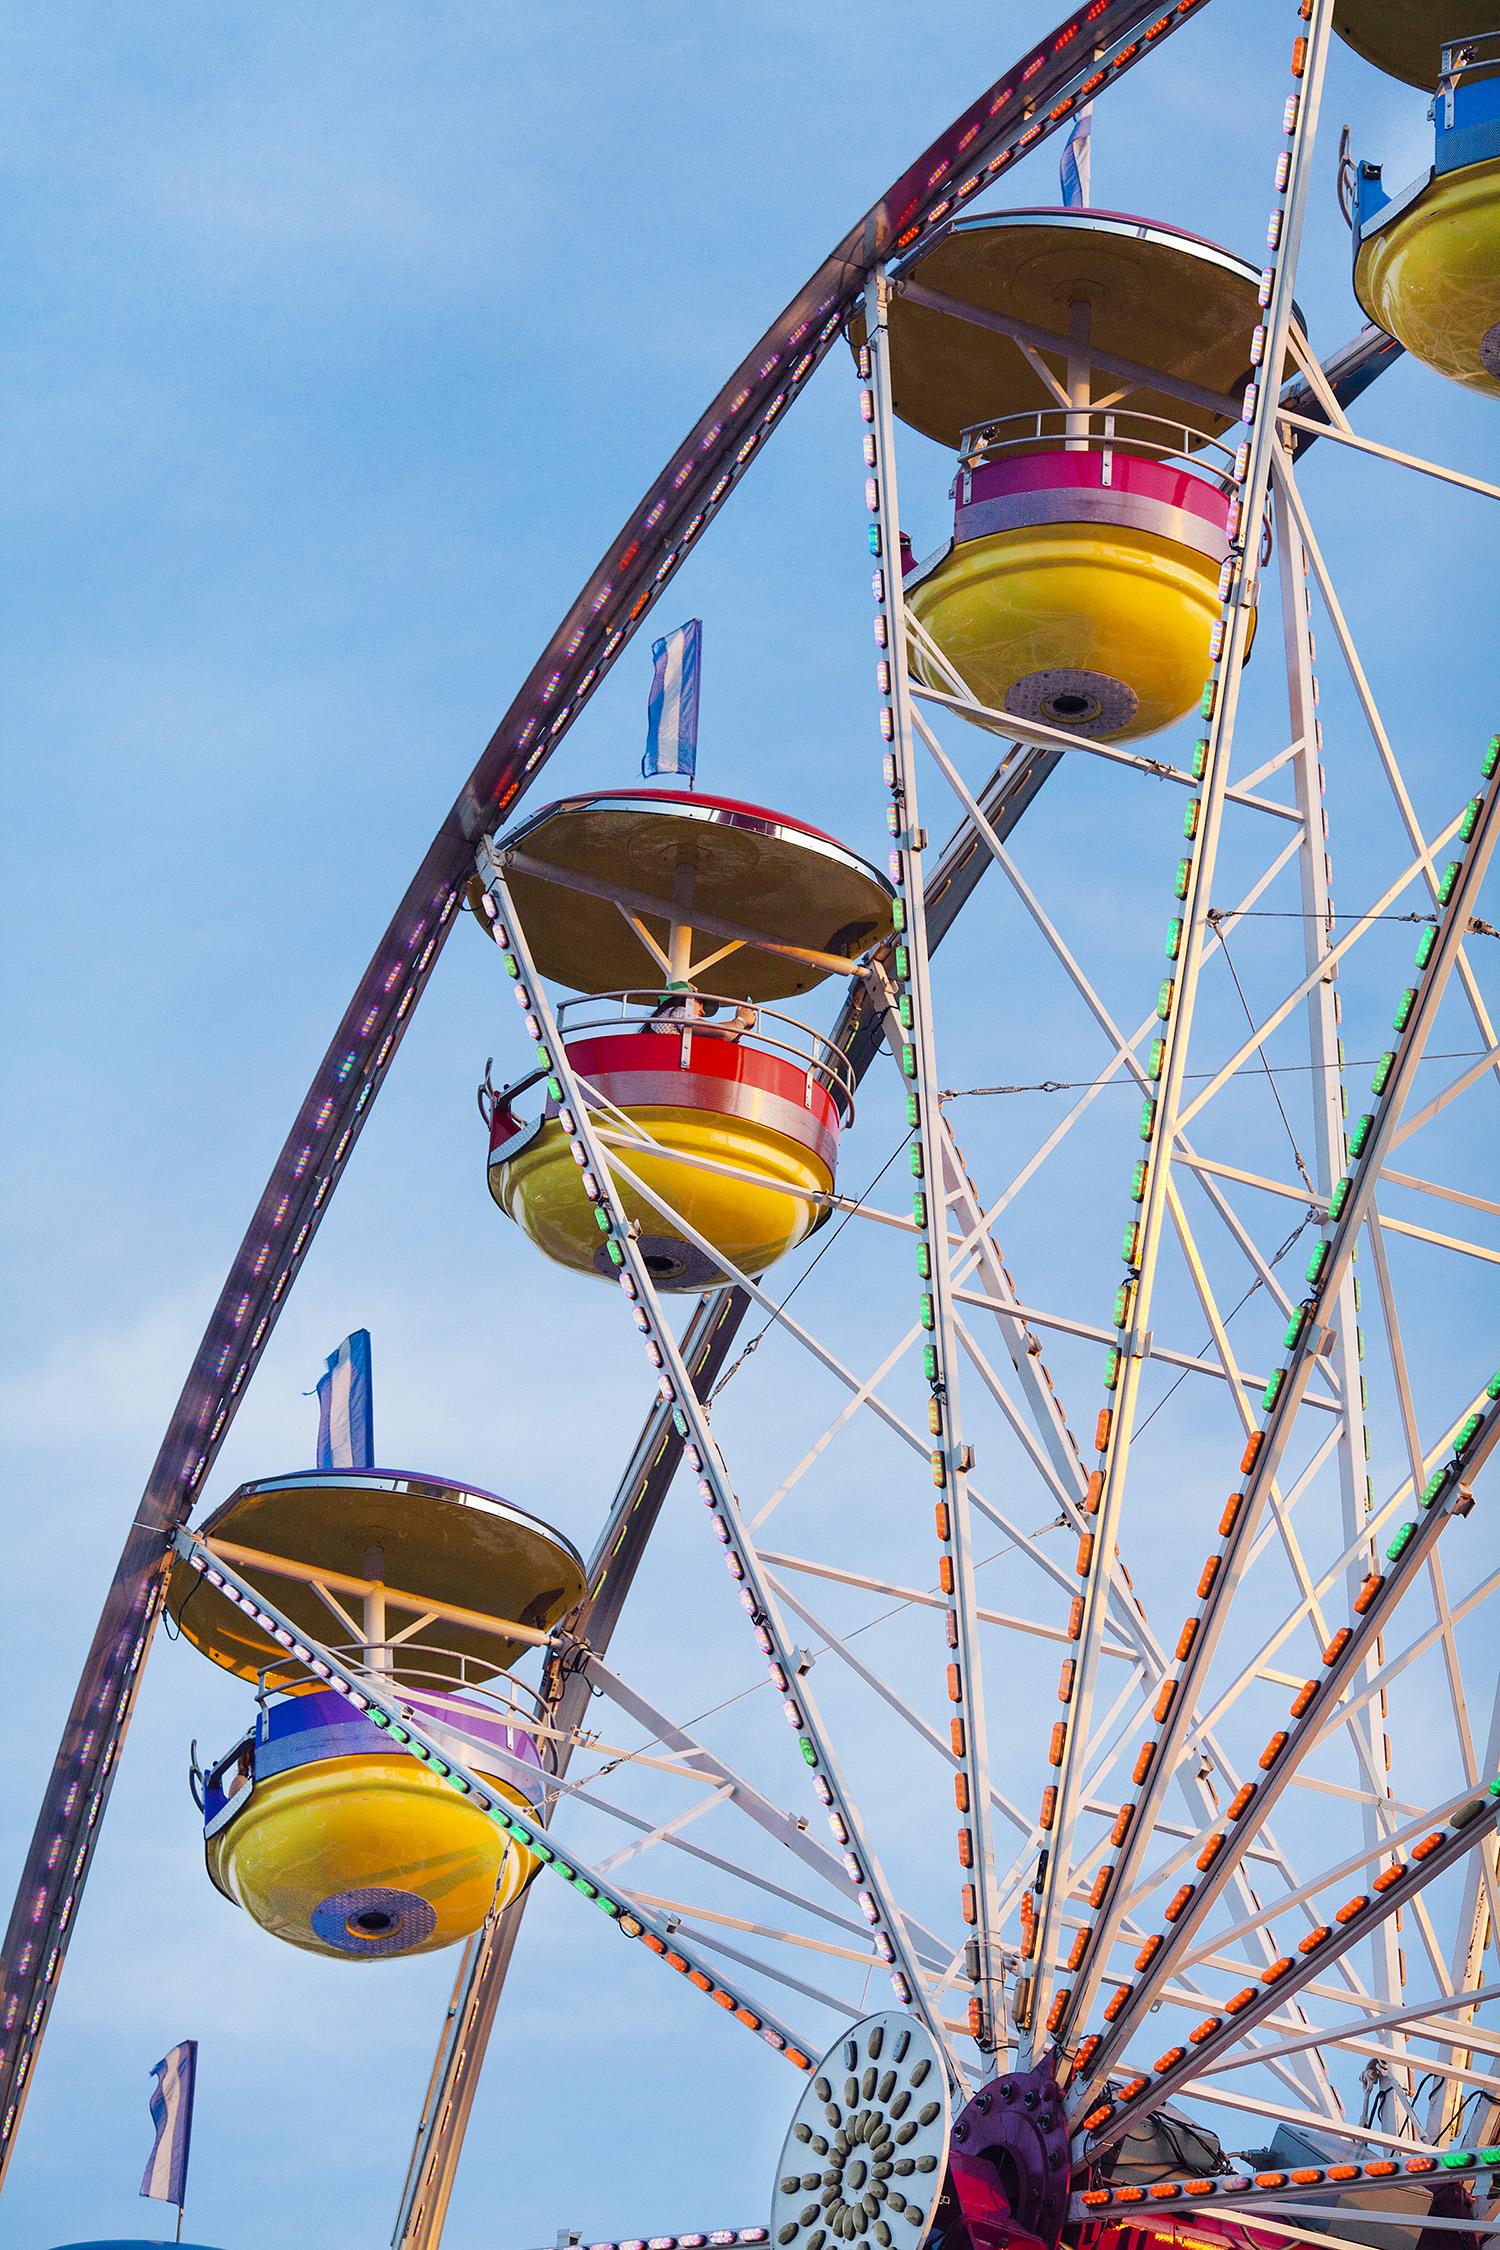 lifestyle-editorial-washington-dc-malek-naz-photography-montgomery-county-fair-ferris_wheel.jpg